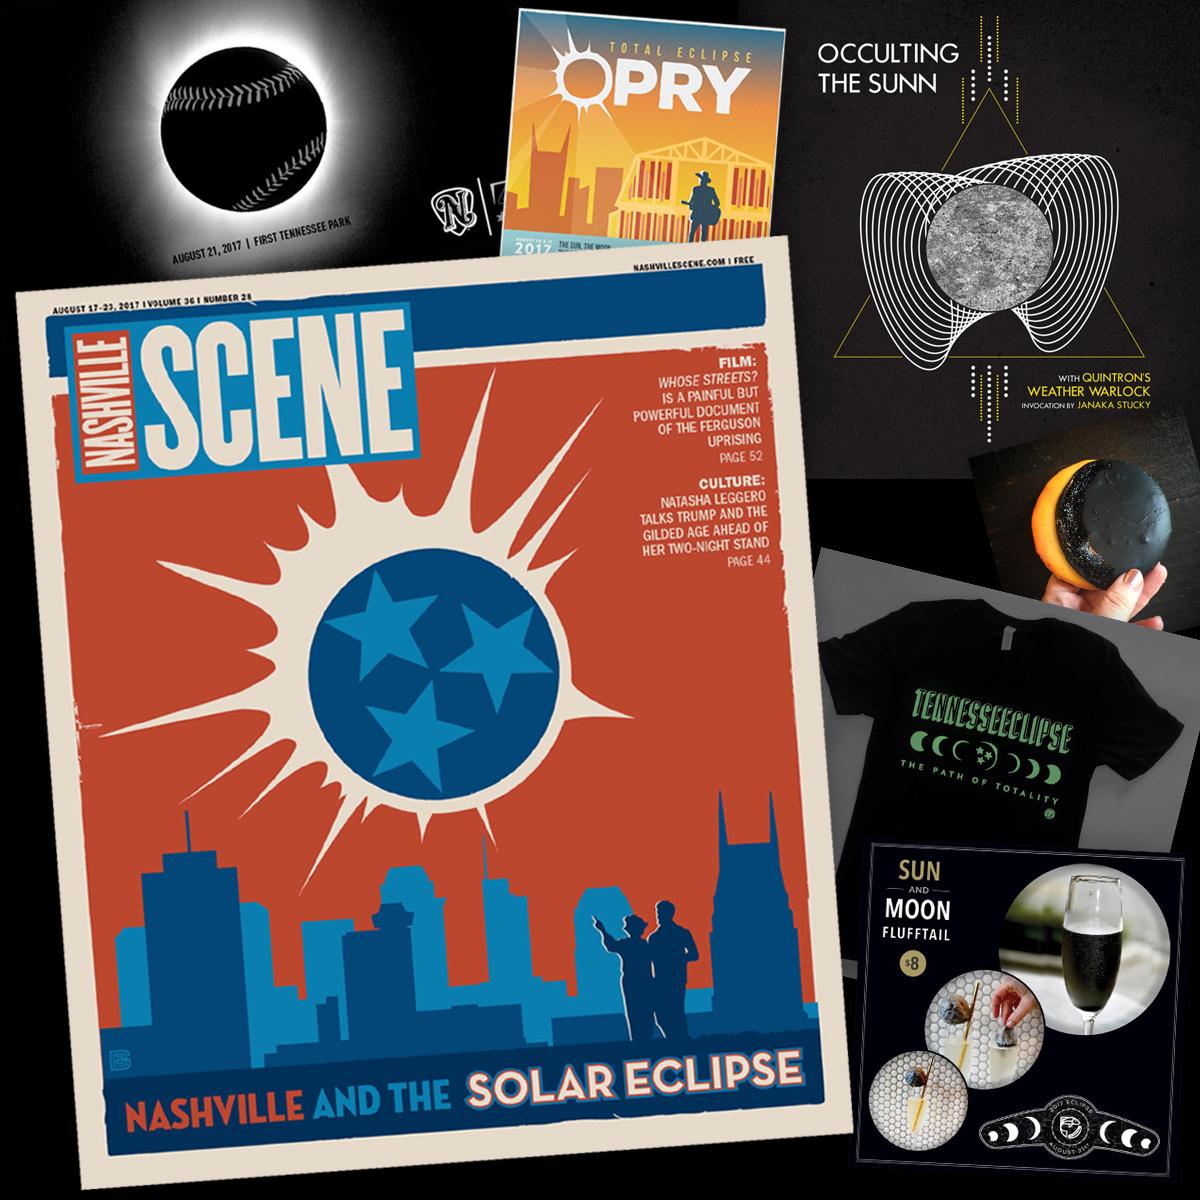 nasheclipse.jpg